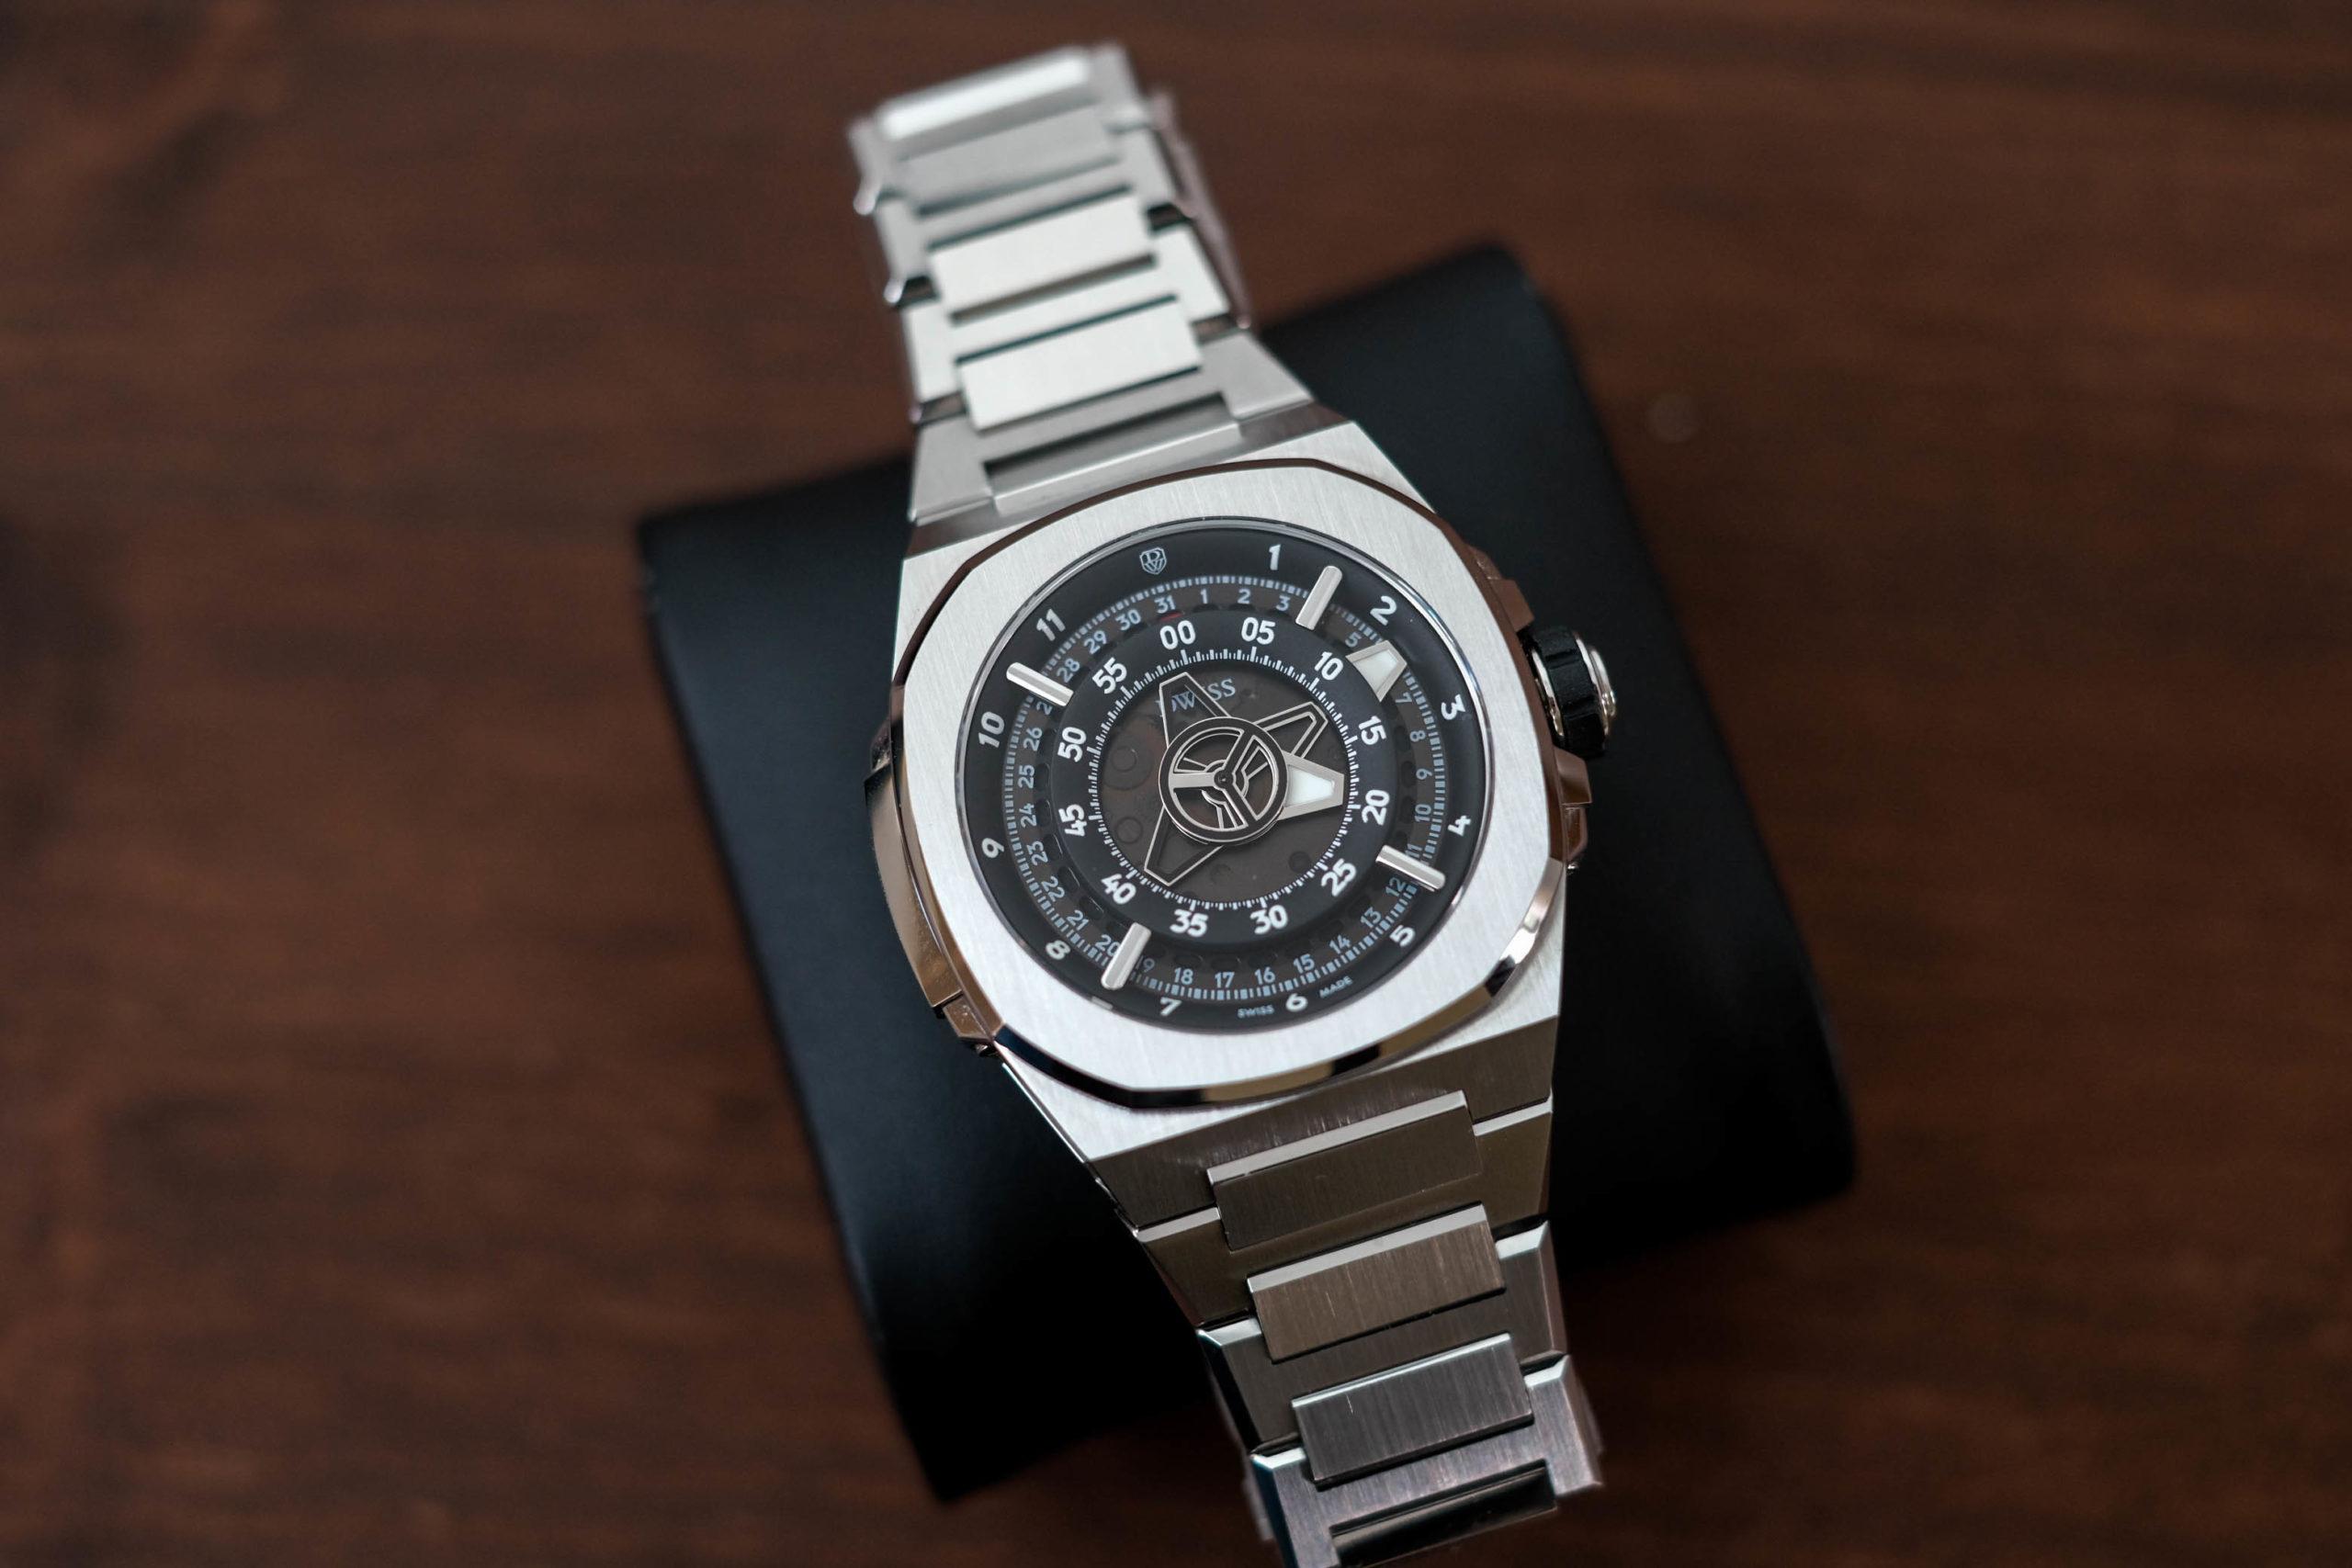 Full photo of M3 watch